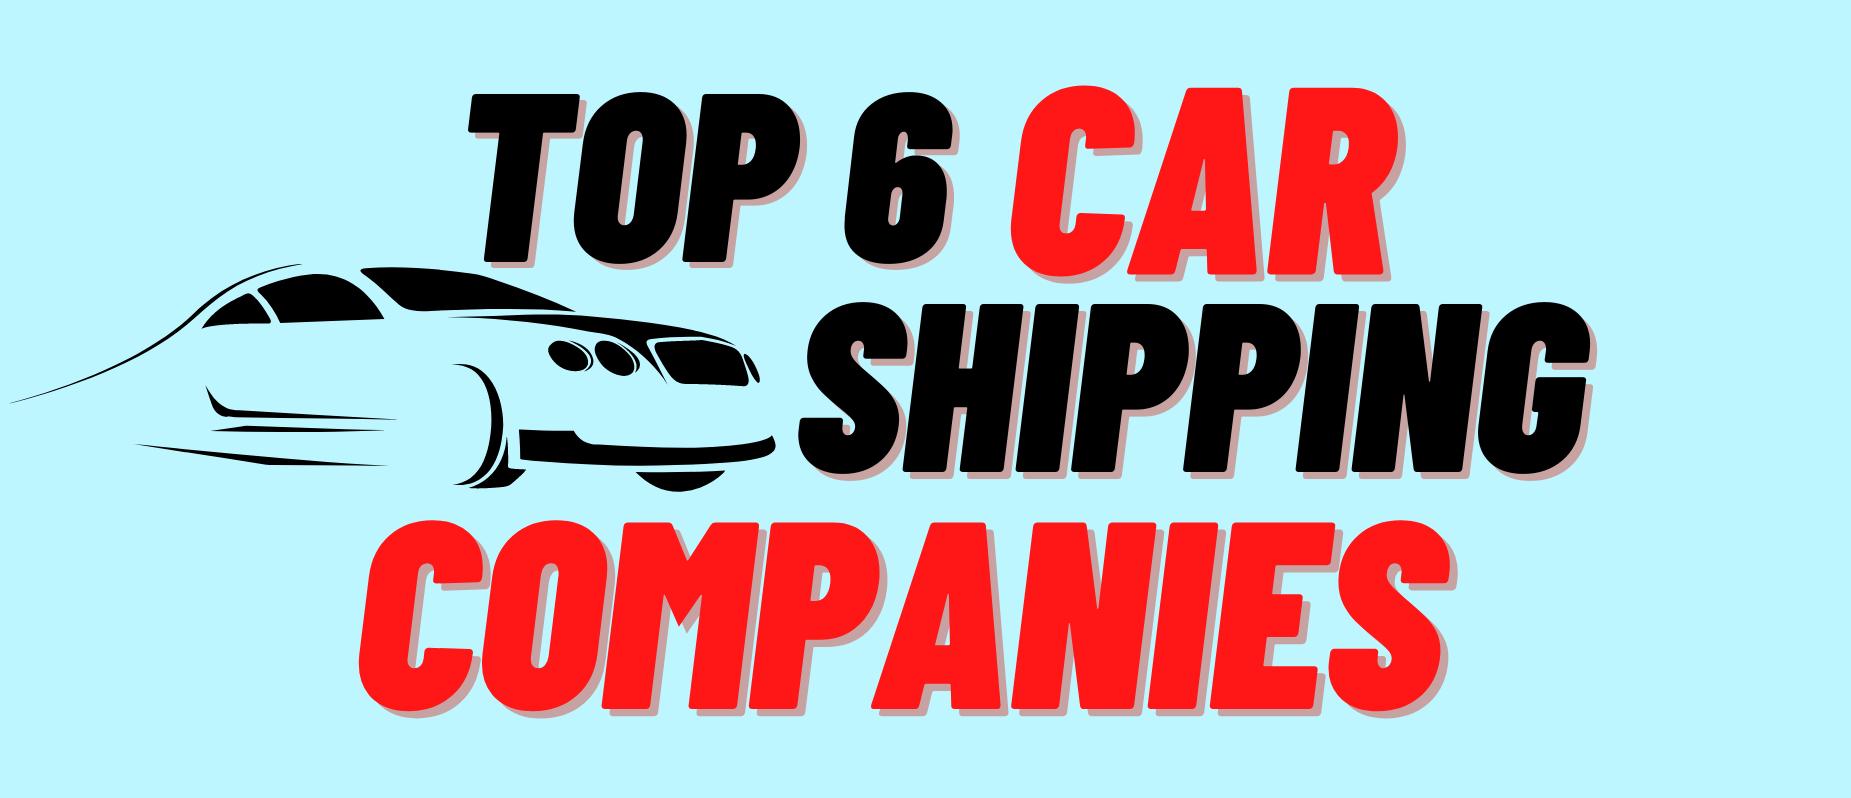 Top 6 car shipping companies